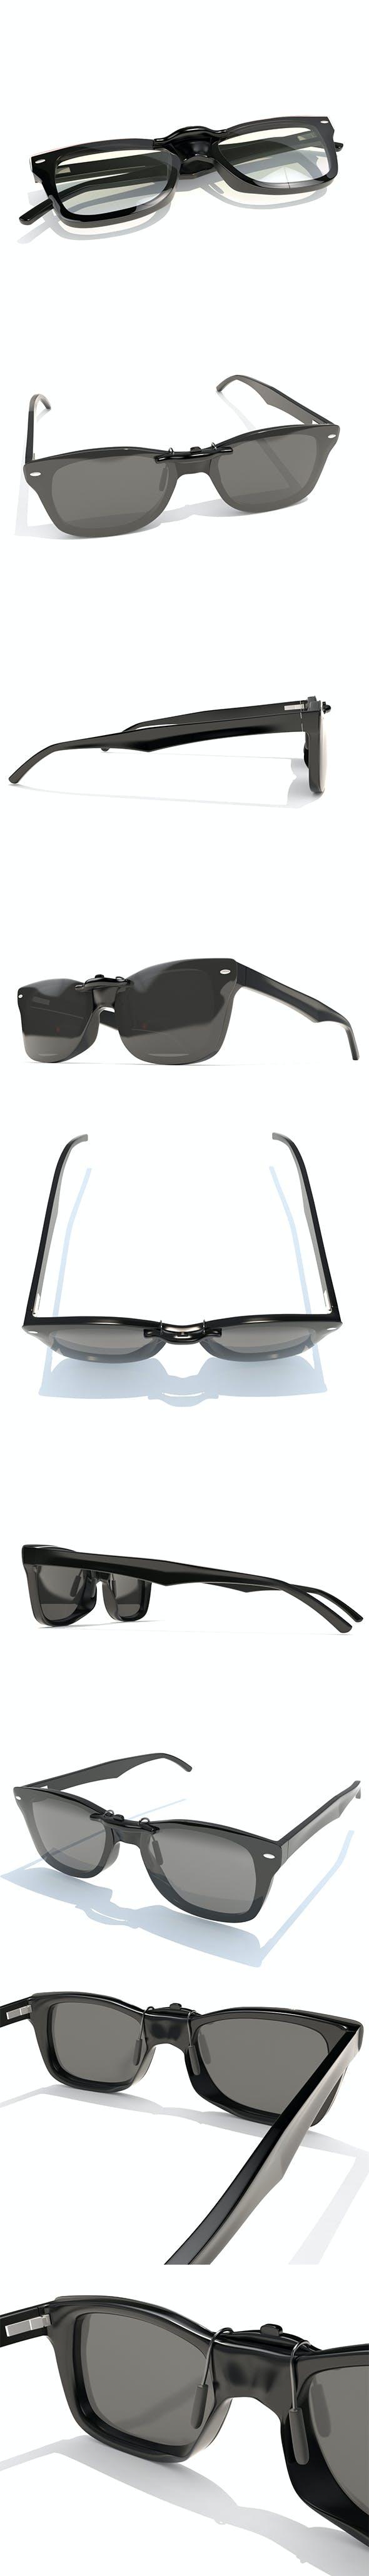 Sunglasses Wayfarer Ray Ban - 3DOcean Item for Sale